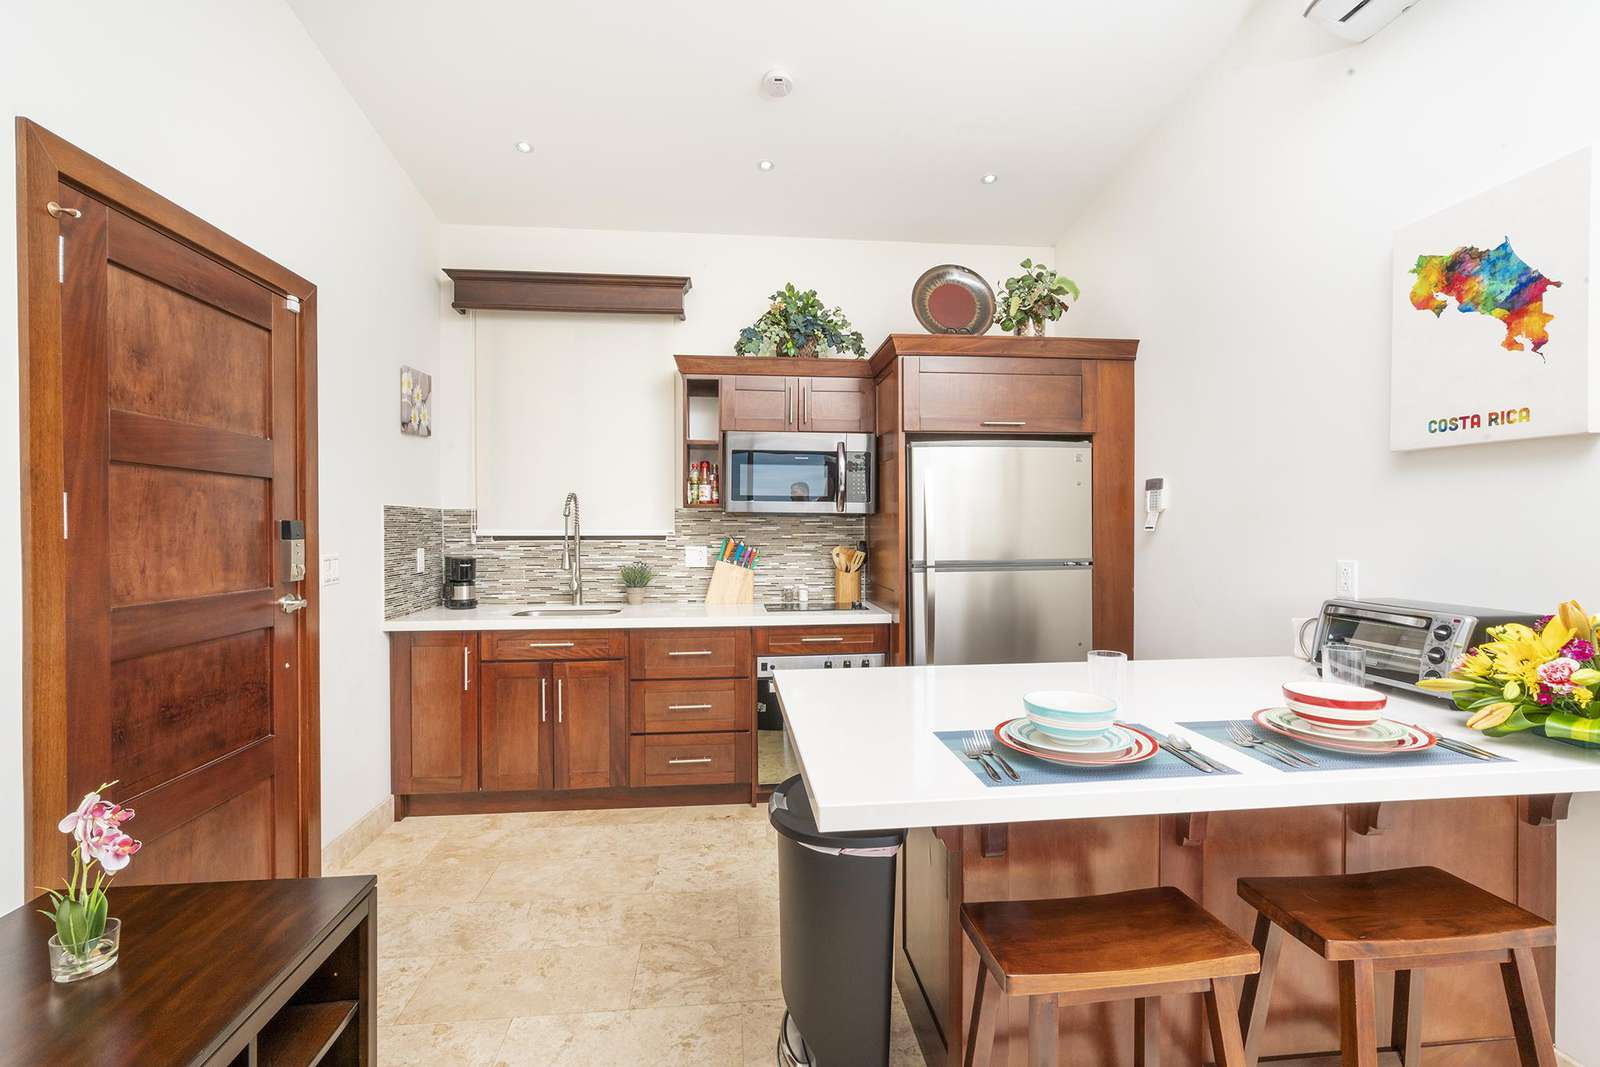 View of gourmet kitchen, breakfast bar, main entry